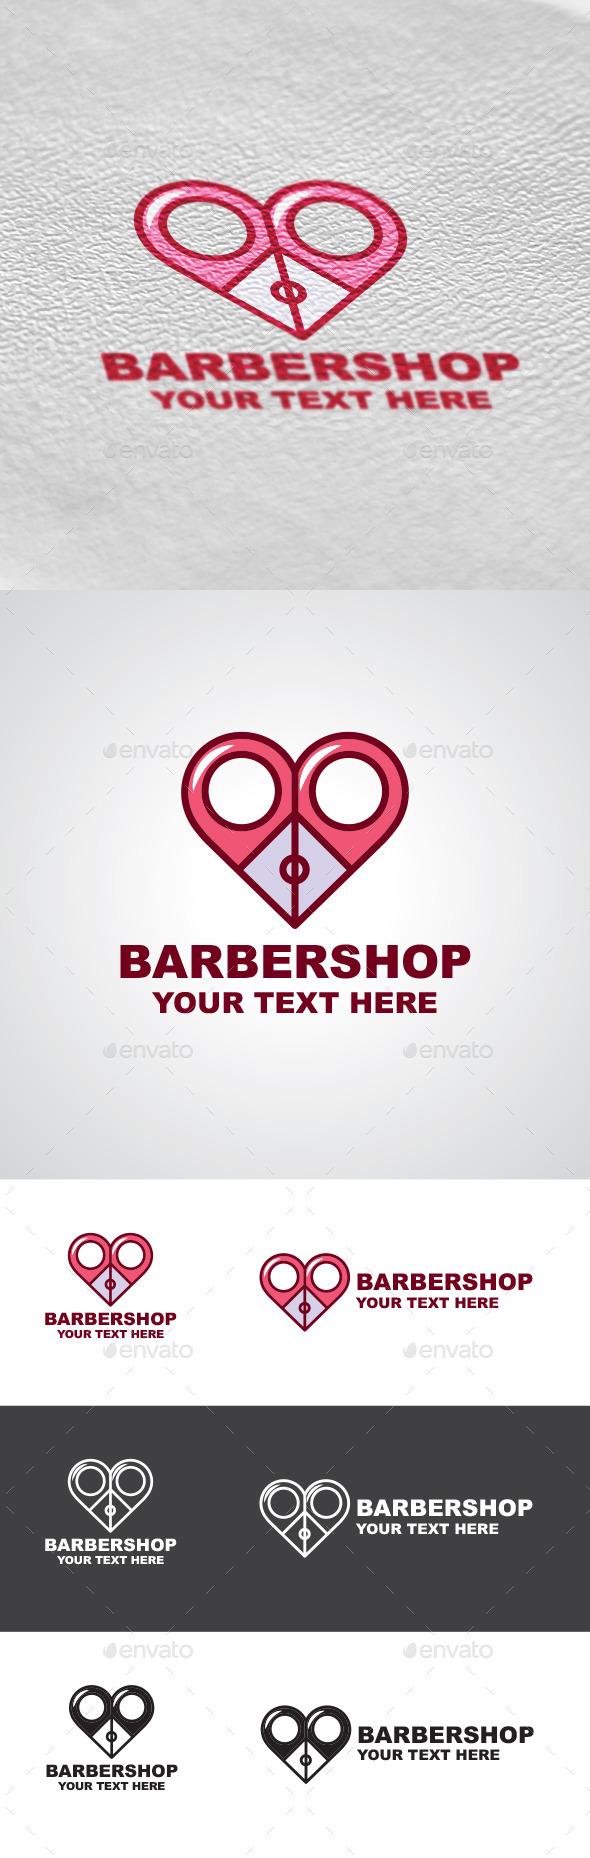 GraphicRiver Barbershop Logo Design 9402986